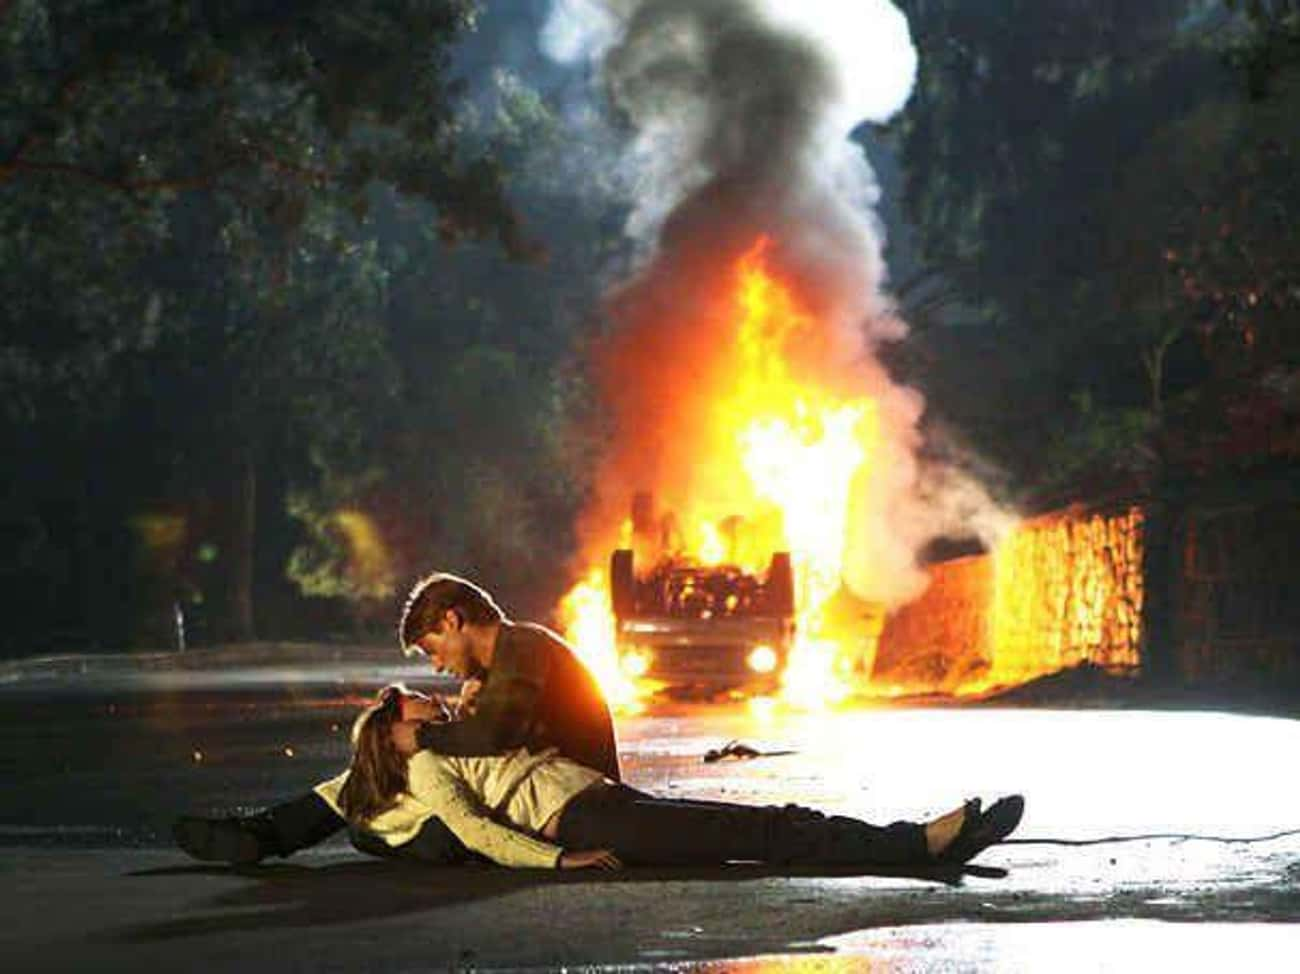 Mischa Barton Spoiled Marissa's Fatal Accident